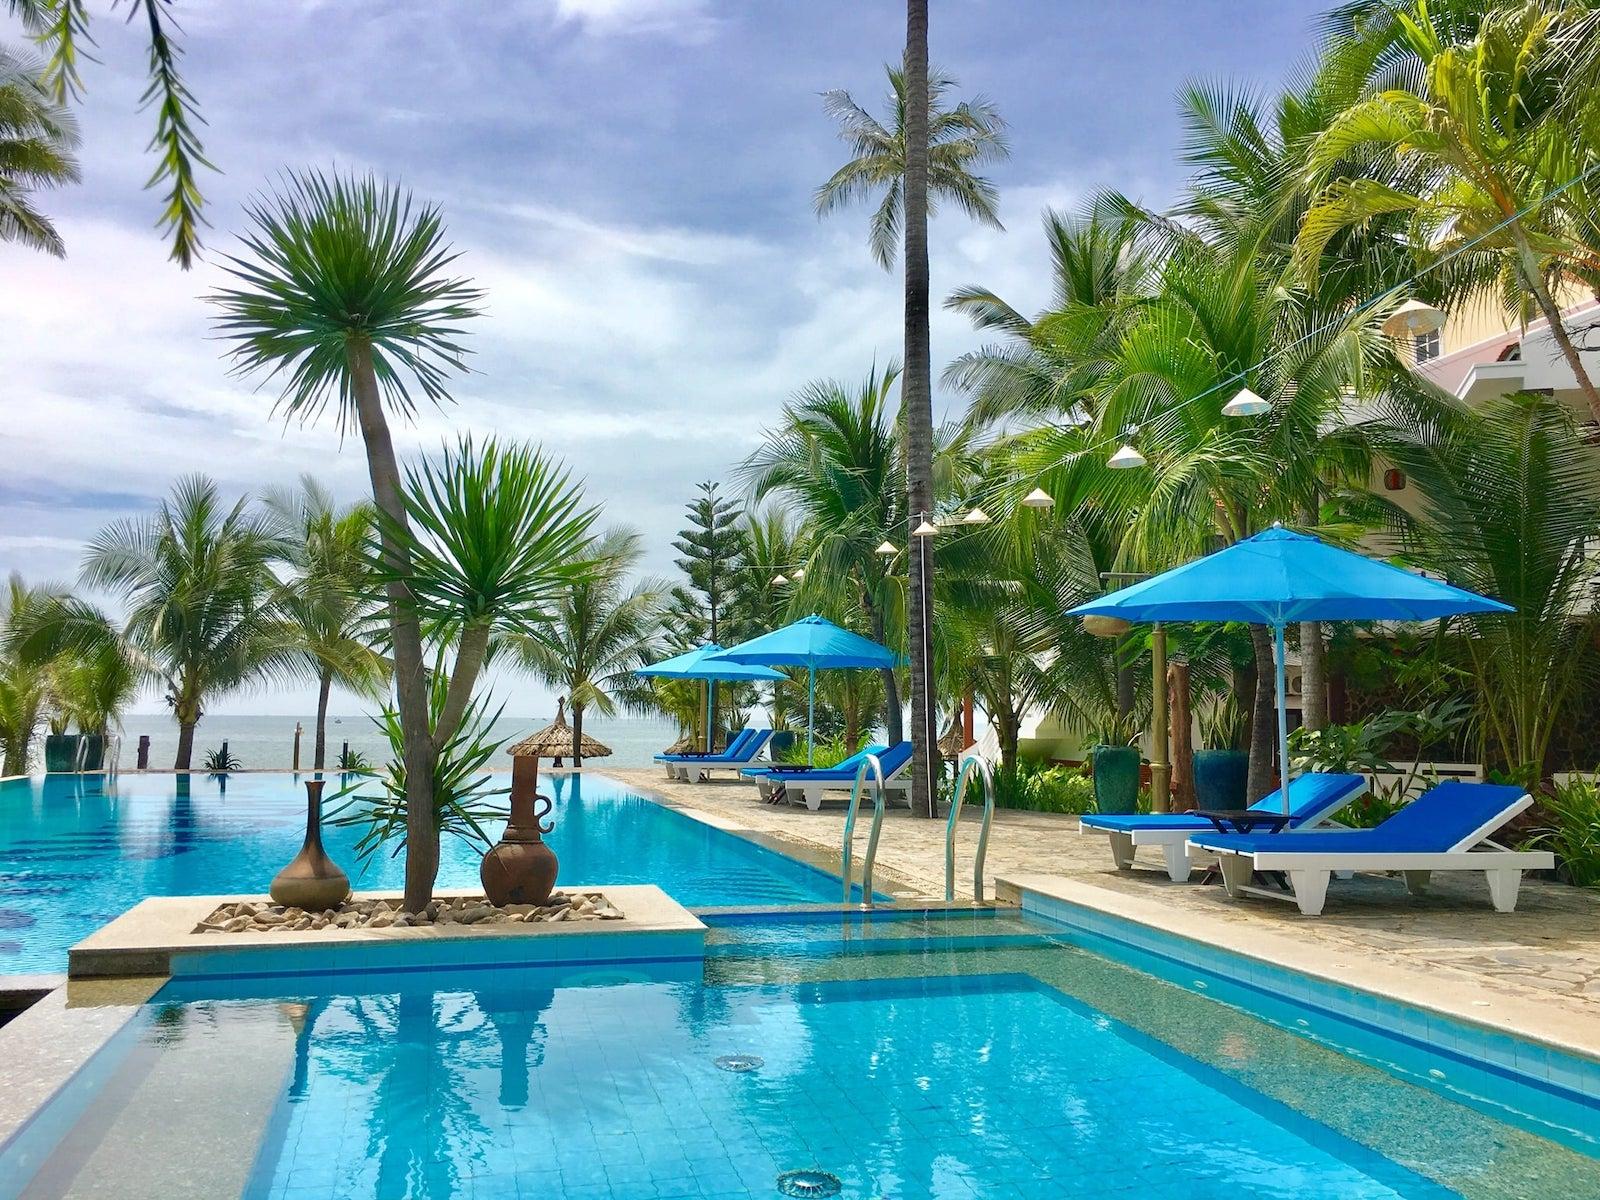 Image of the Ravenala Boutique Resort Mui Ne pool in Vietnam